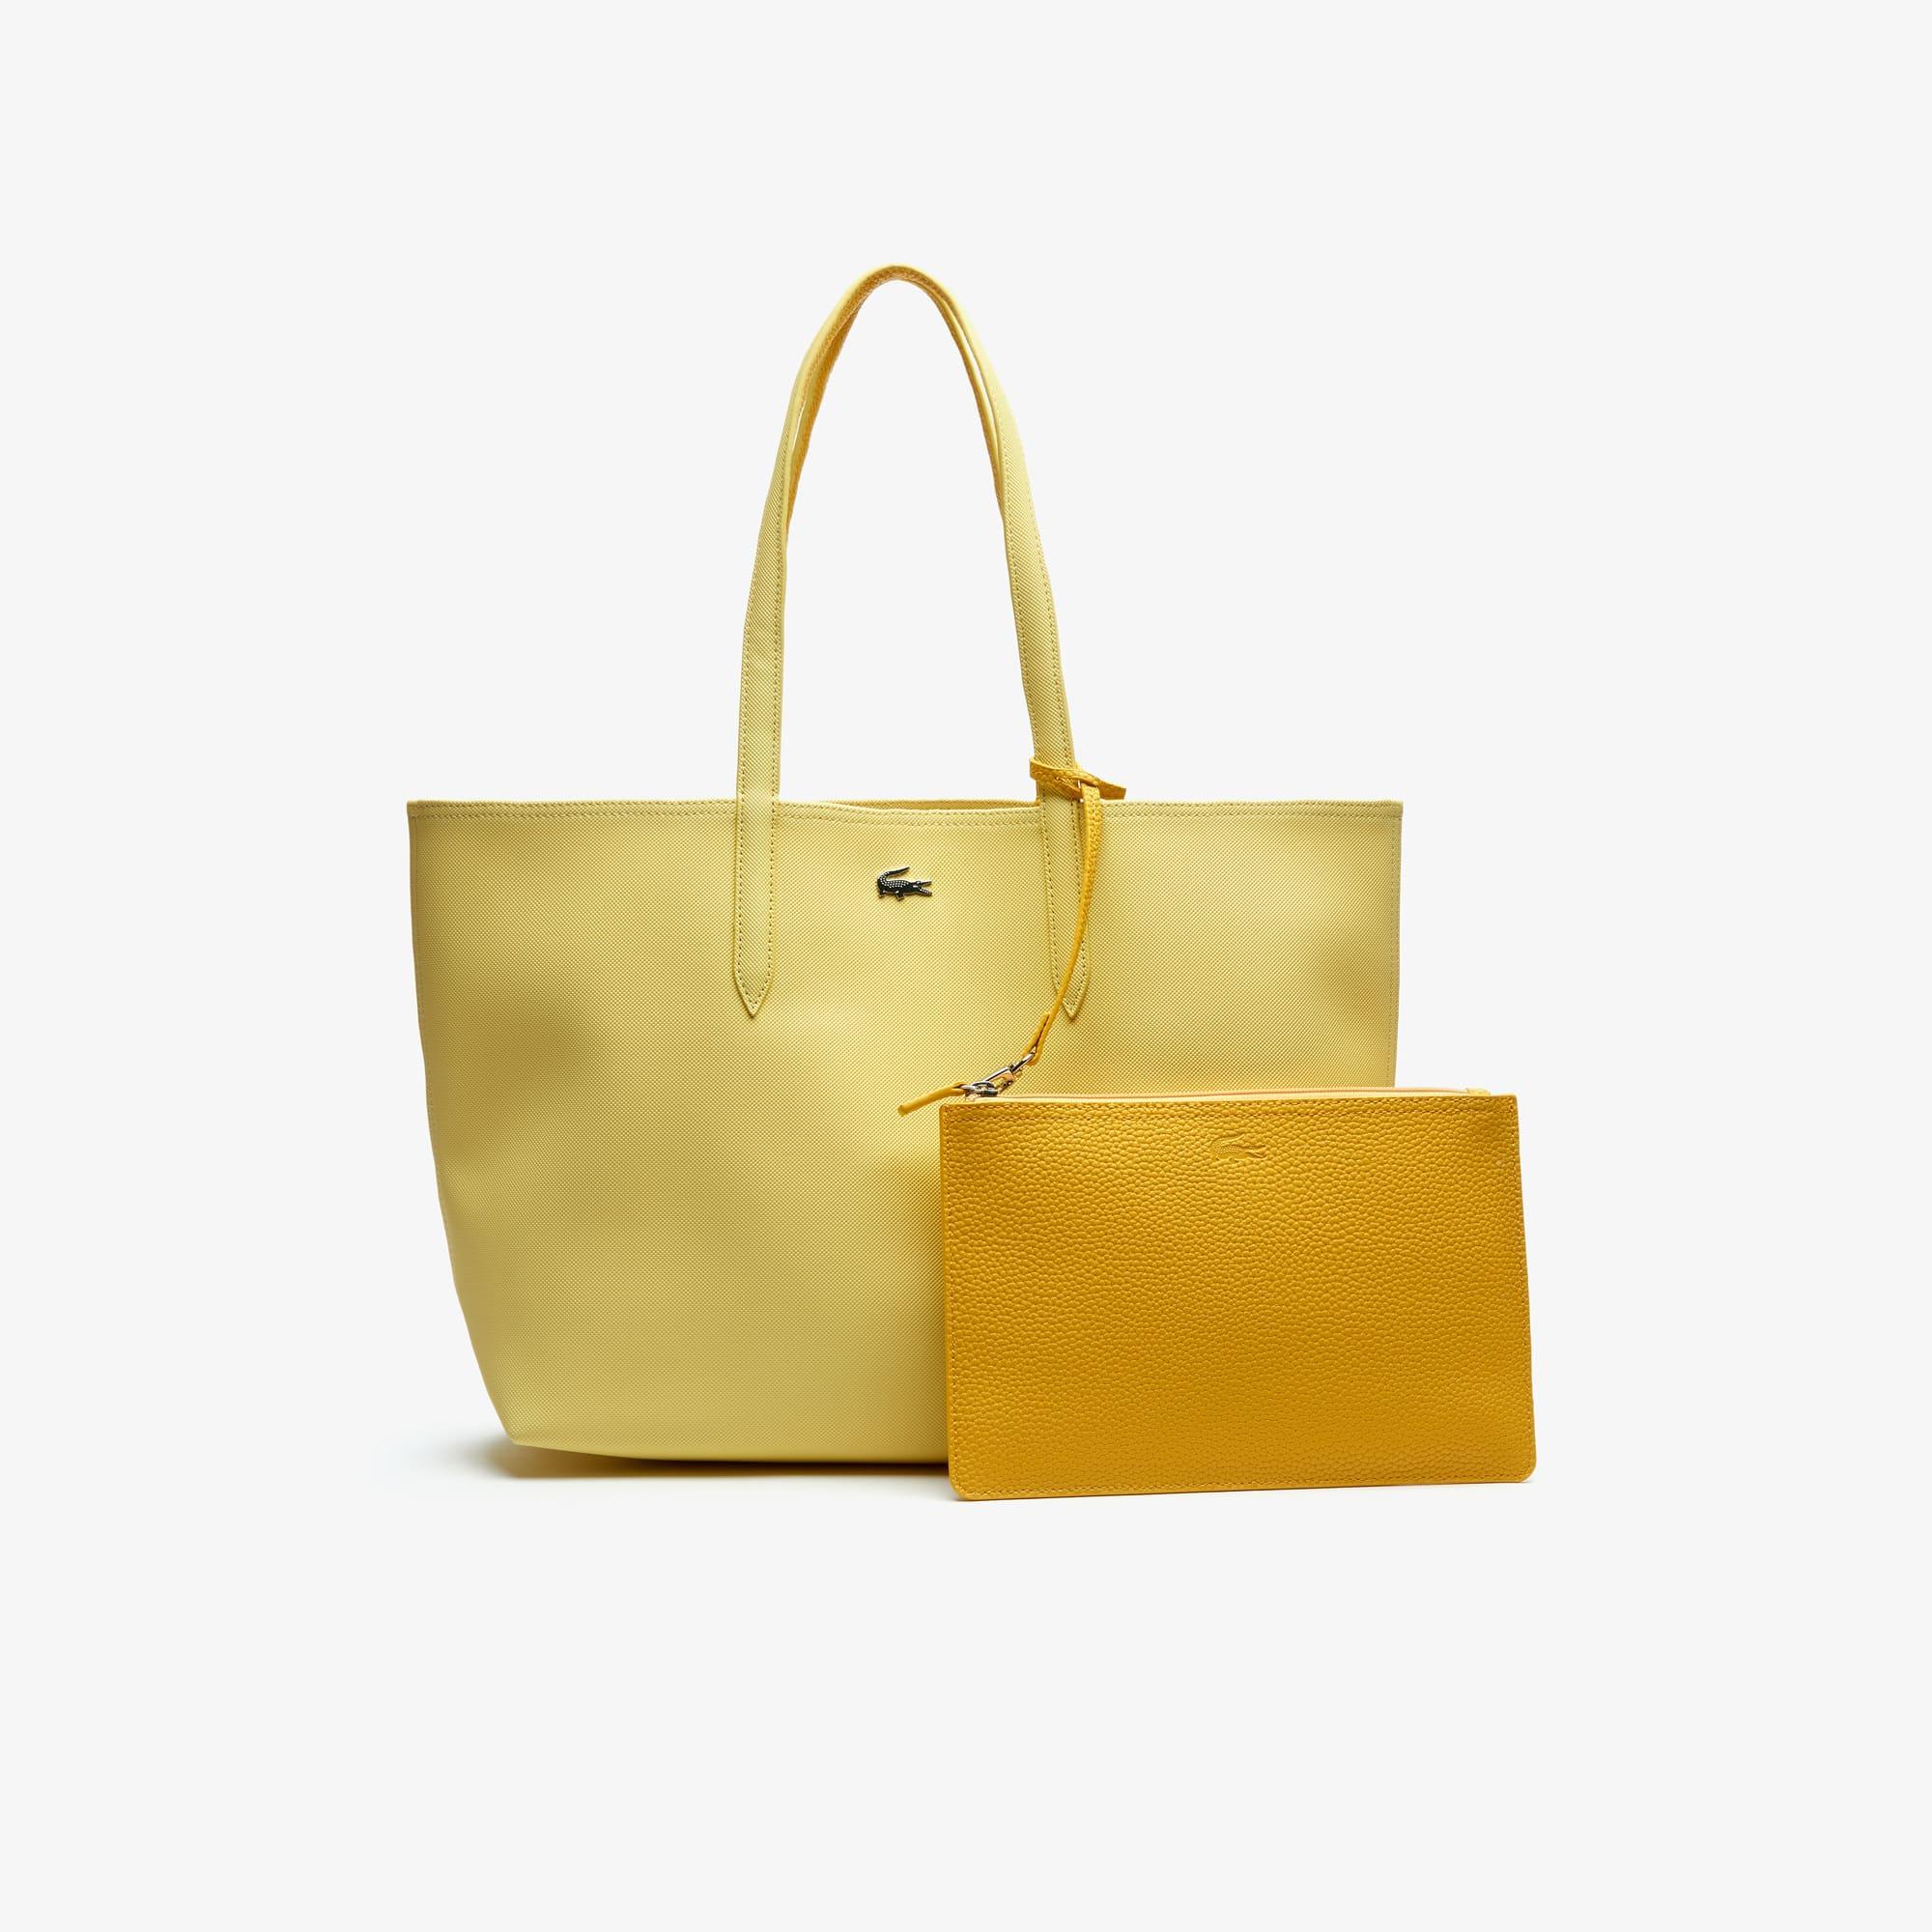 92557b42a984b Bags   Handbags Collection